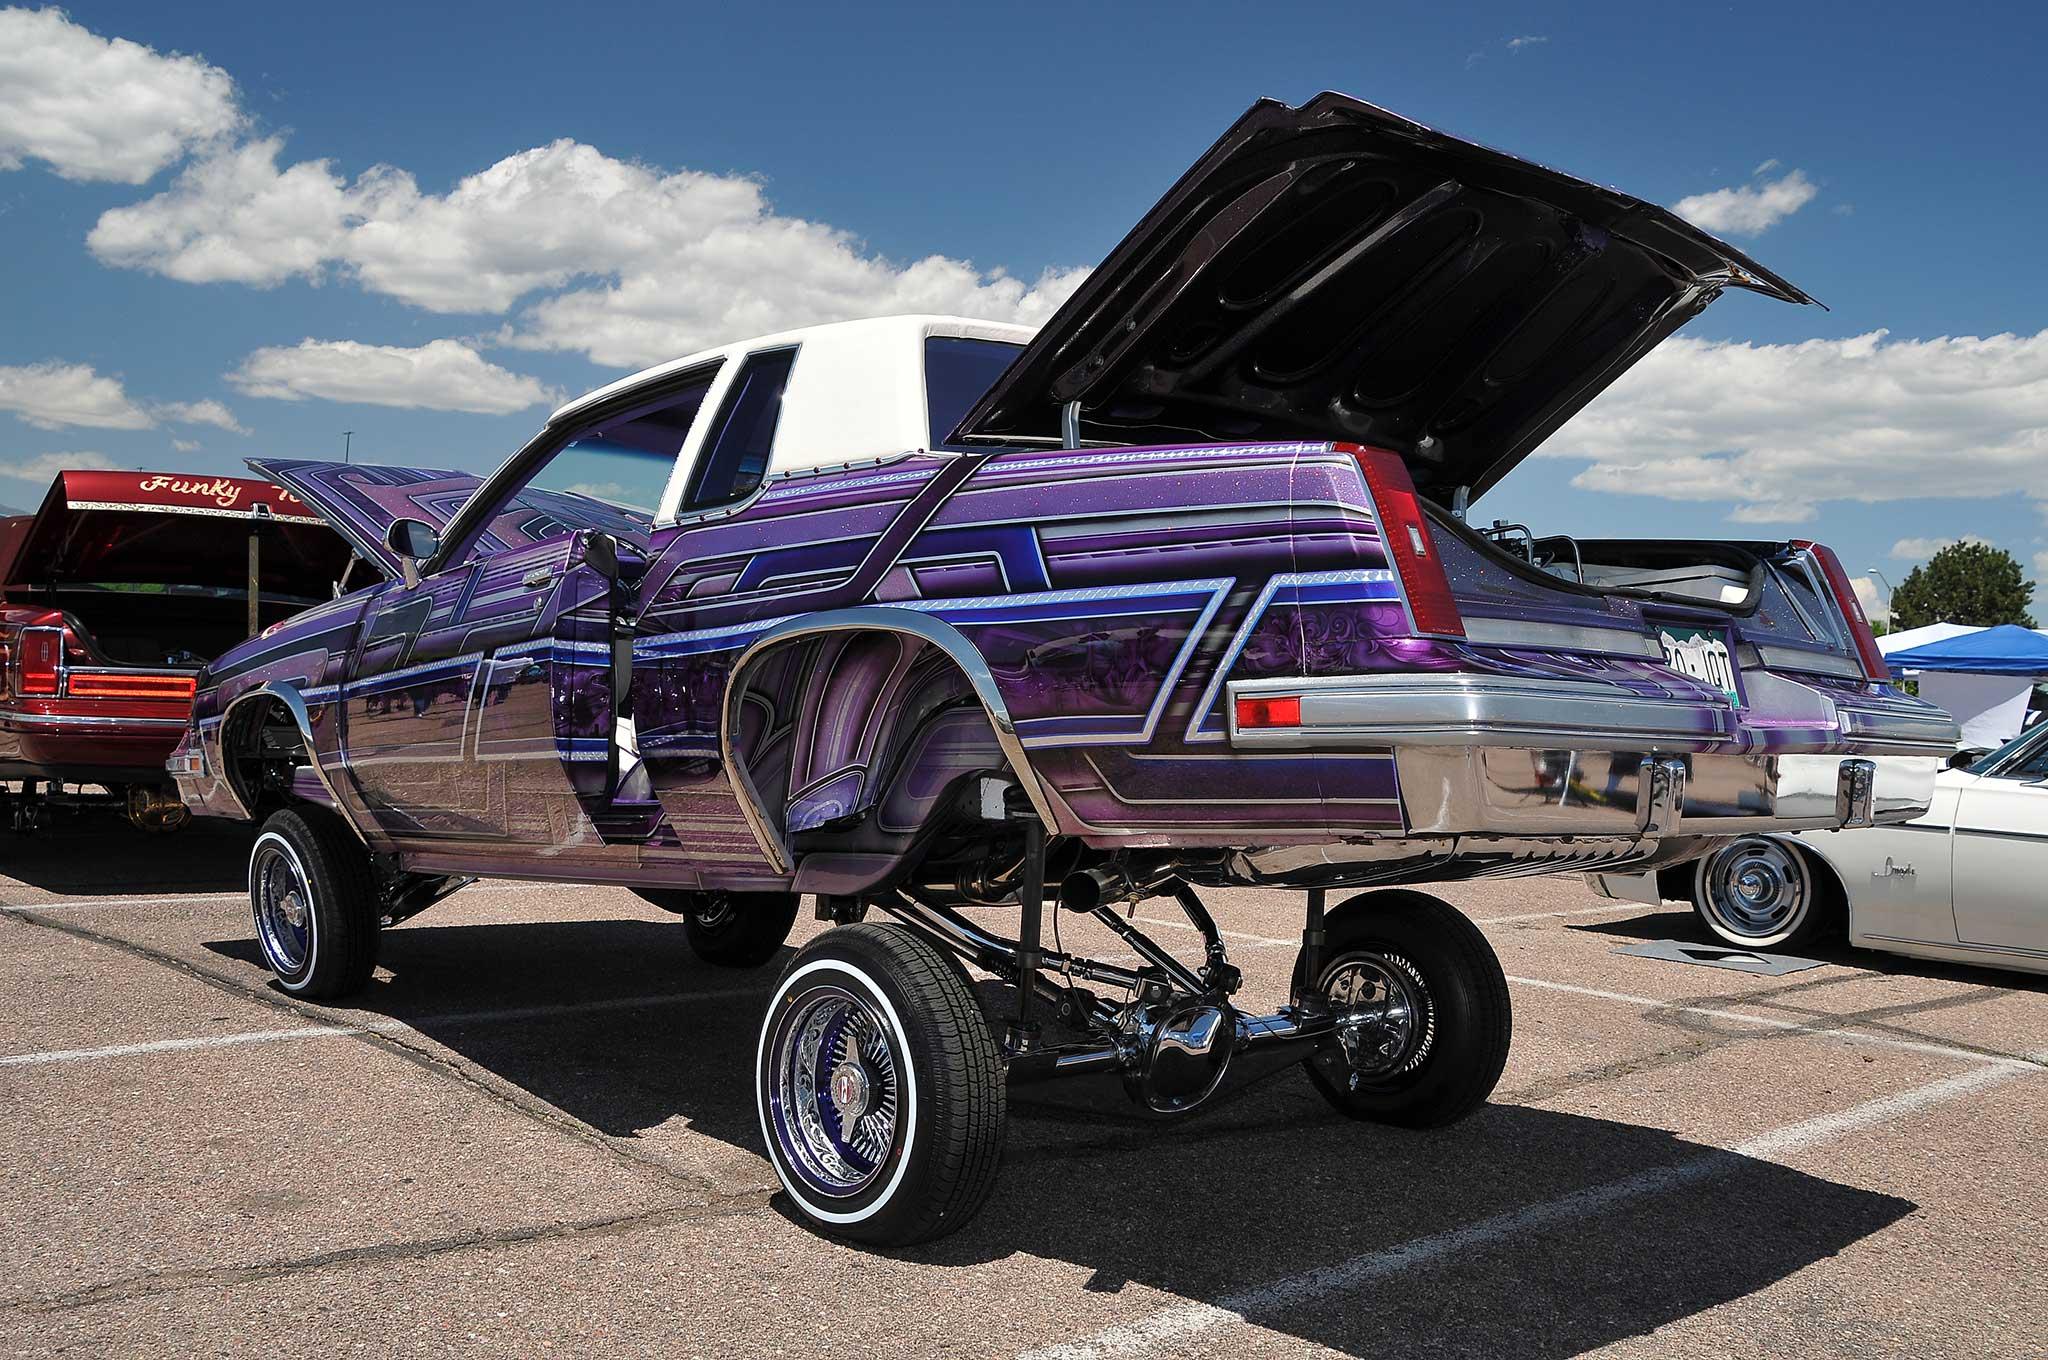 8th Annual City Wide Car Truck Show Oldsmobile Cutlass